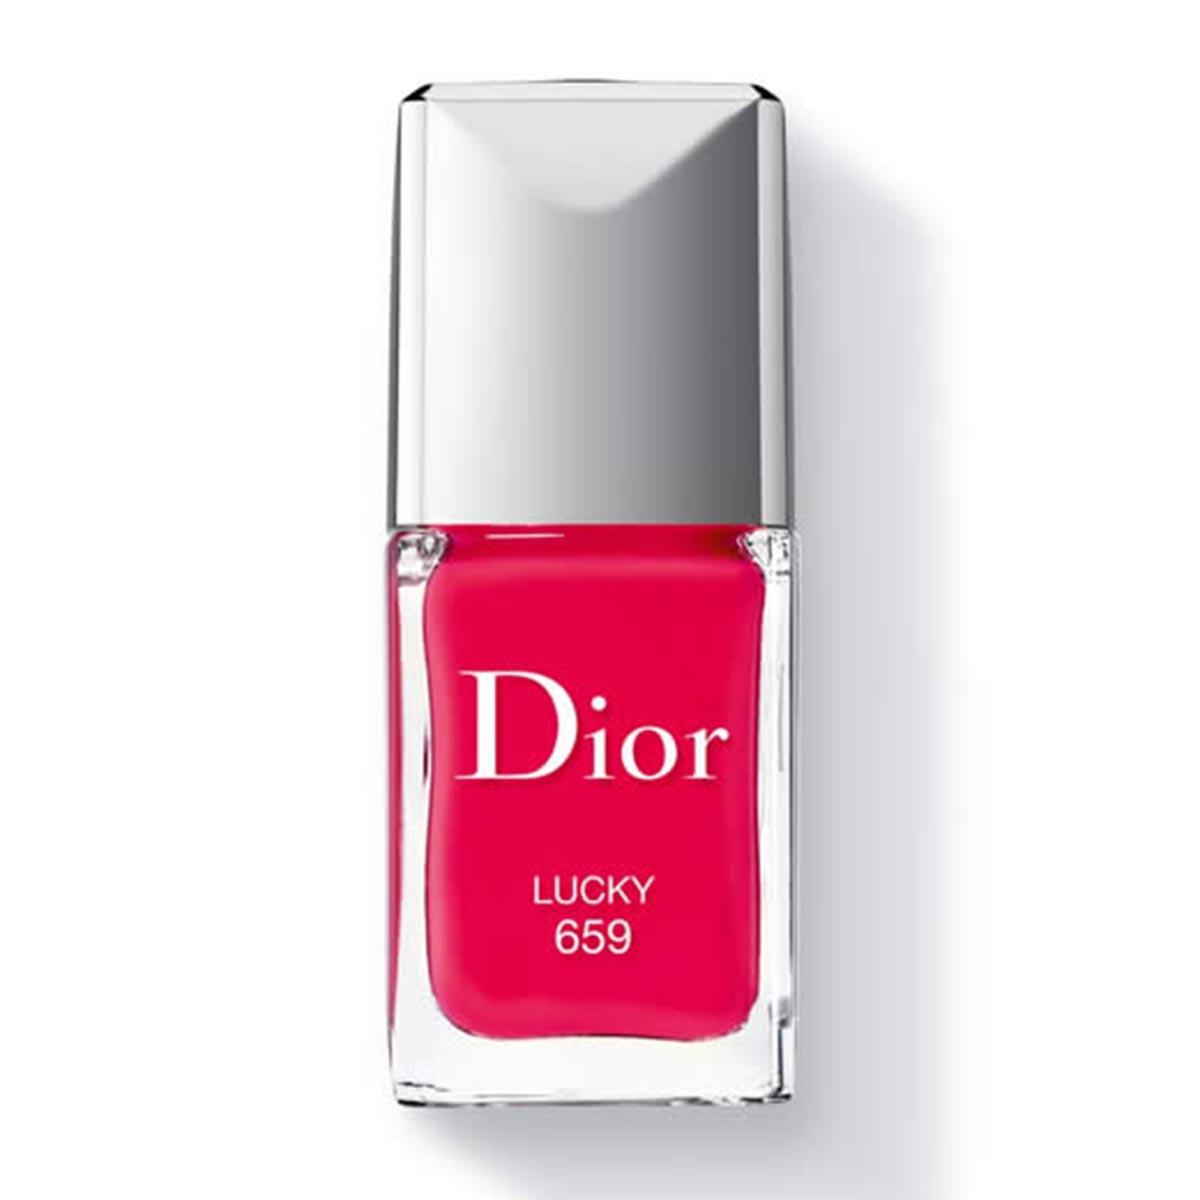 Dior vernis nail lacquer 659 lucky